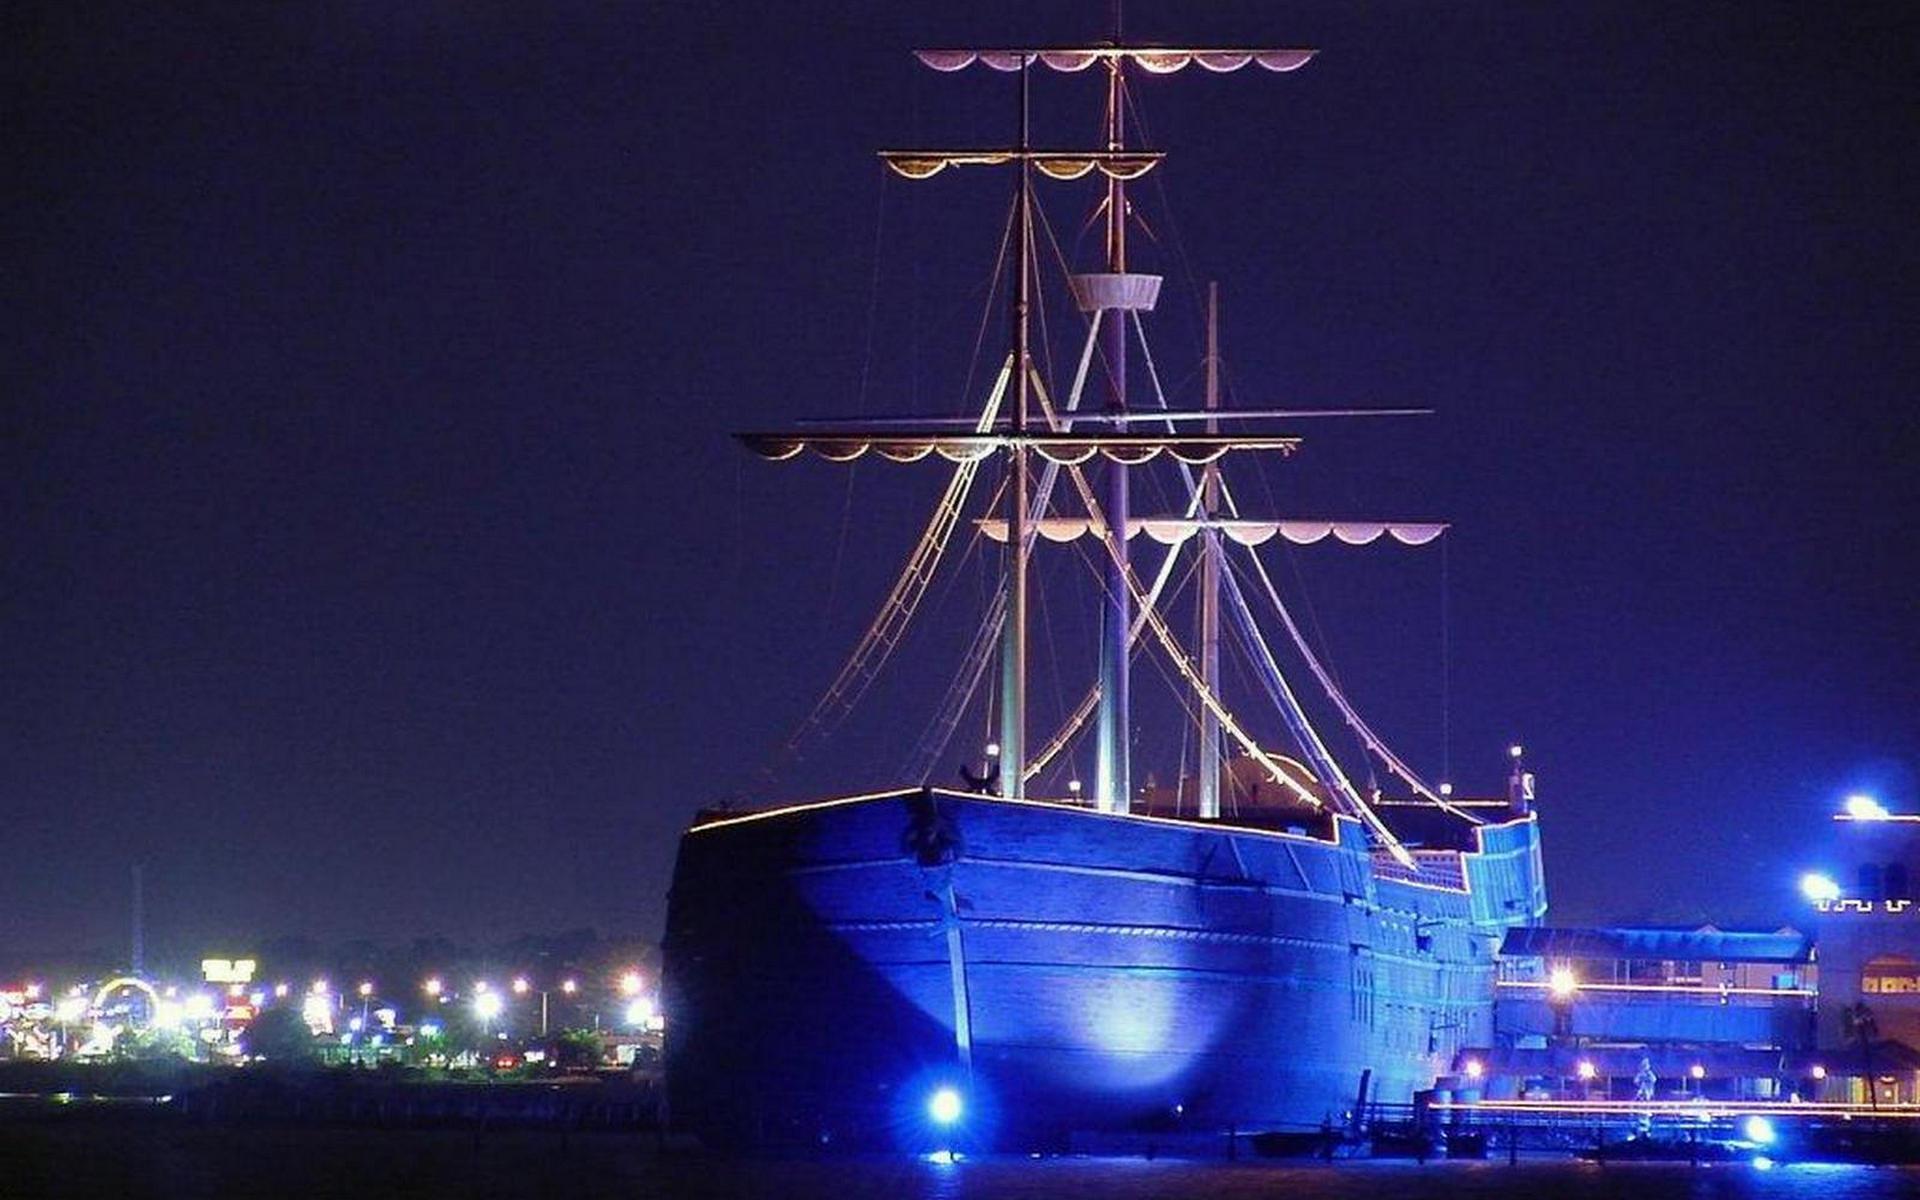 ночь, порт, пристань